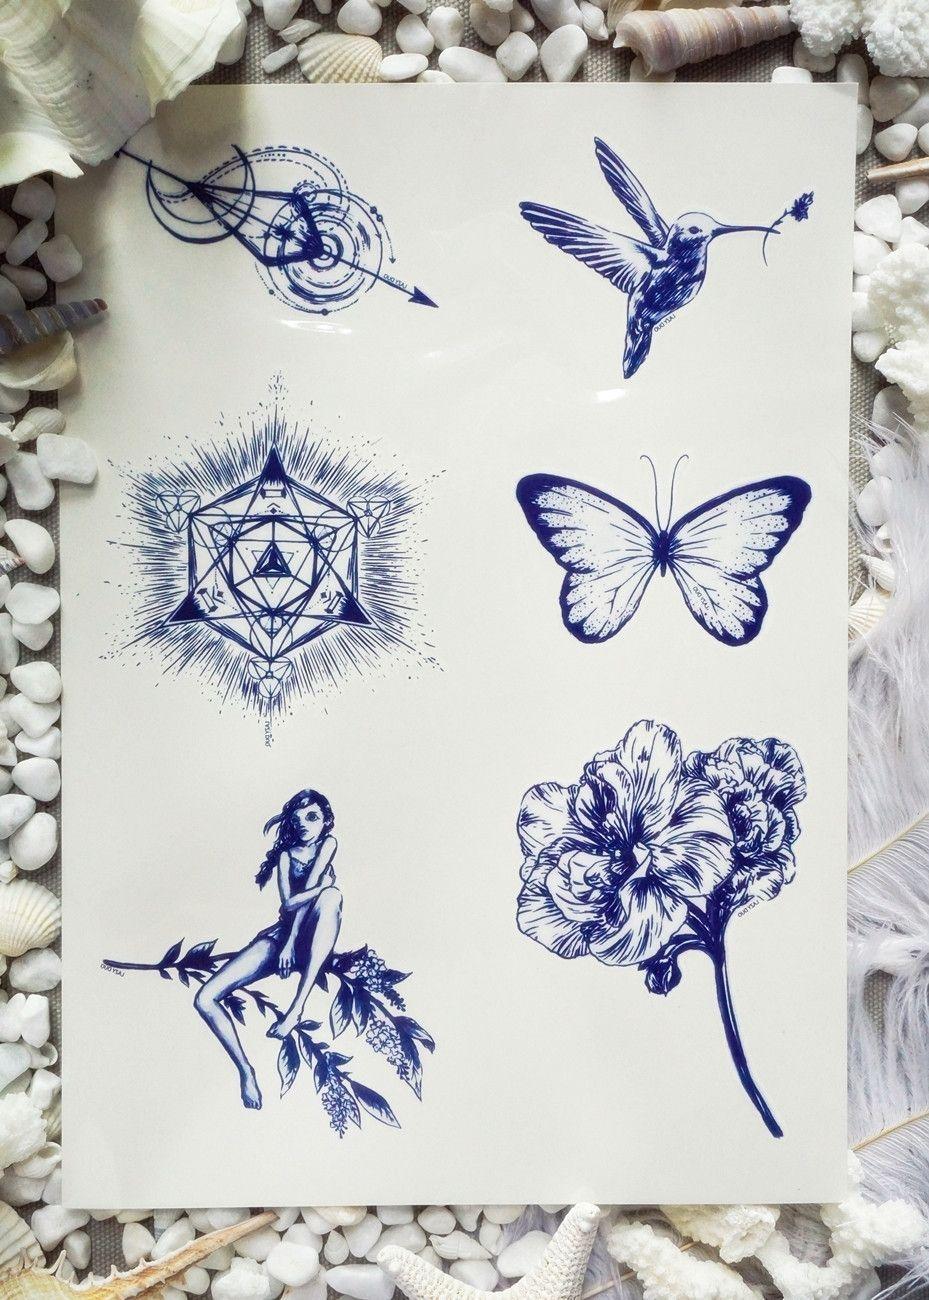 Small spiritual tattoo ideas beetle spirit sparkle sphynx cat bohemian dancer small lazy duo arm